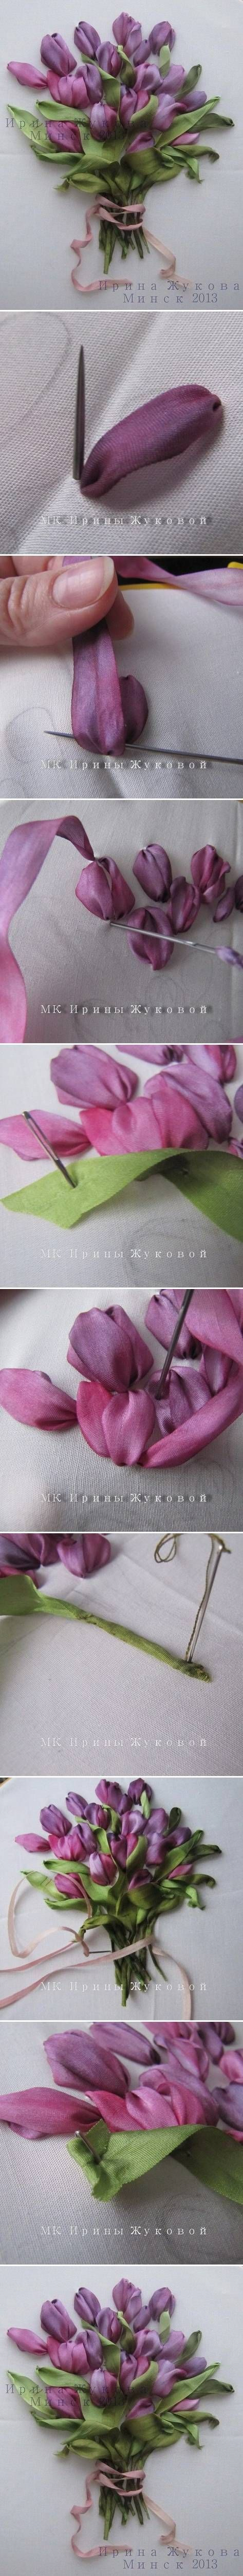 DIY Embroidery Ribbon Flower DIY Projects / UsefulDIY.com